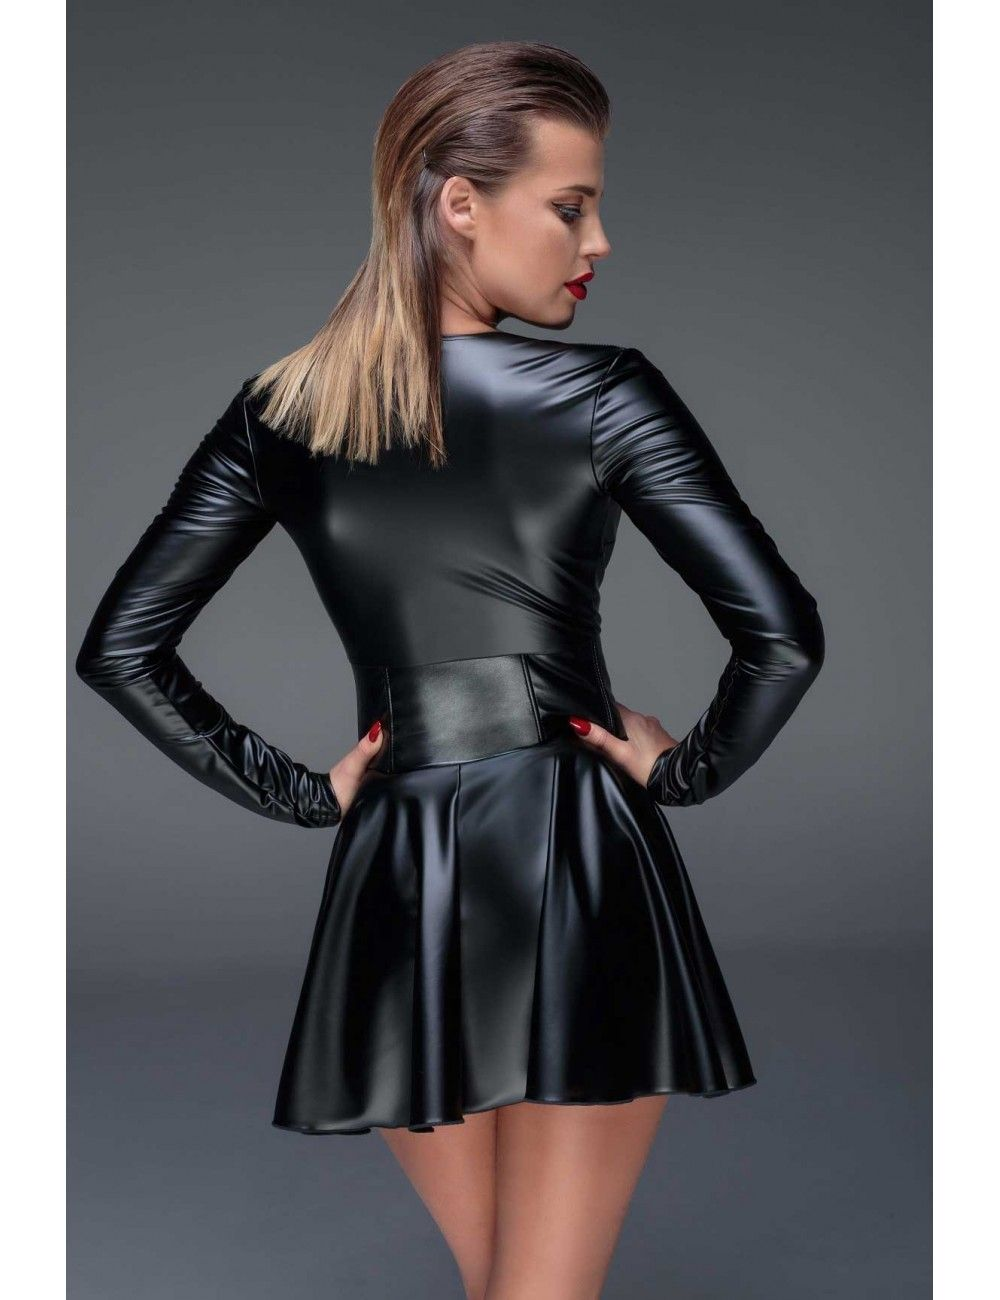 Robe Noir Manche Longue Look Corset Handmade | Tenue libertine